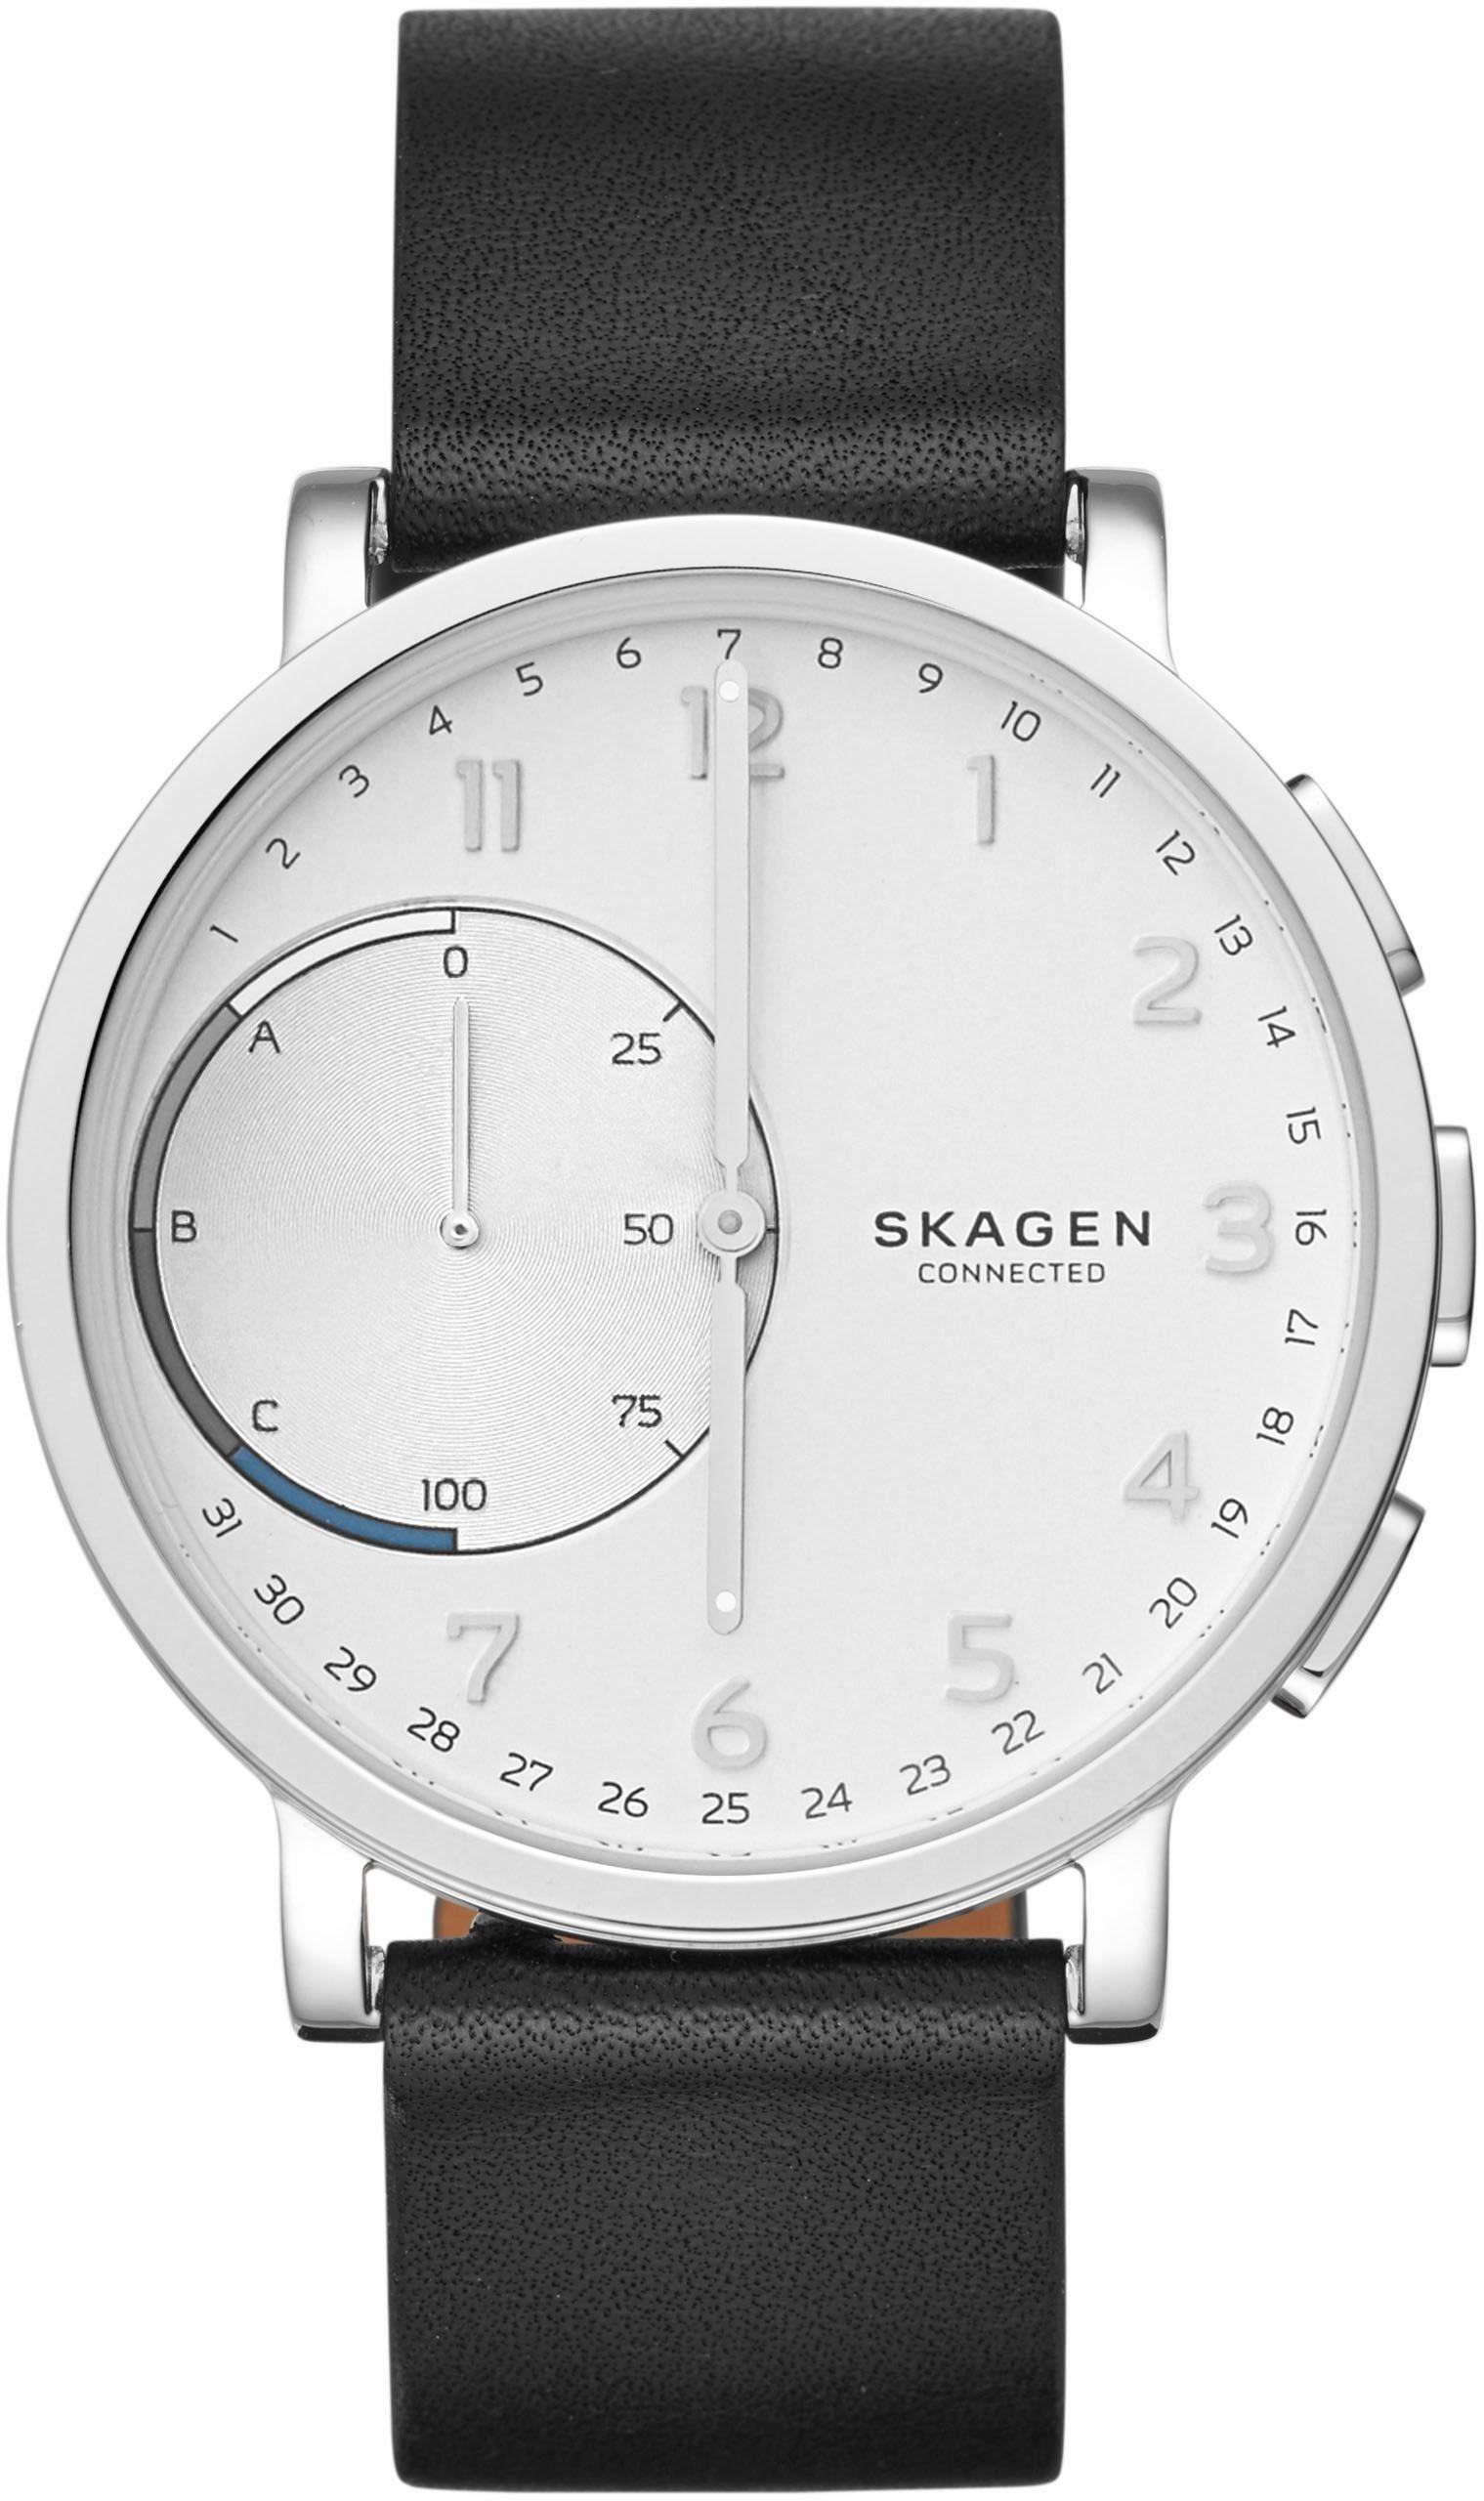 SKAGEN CONNECTED HAGEN CONNECTED, SKT1101 Smartwatch (Android Wear)